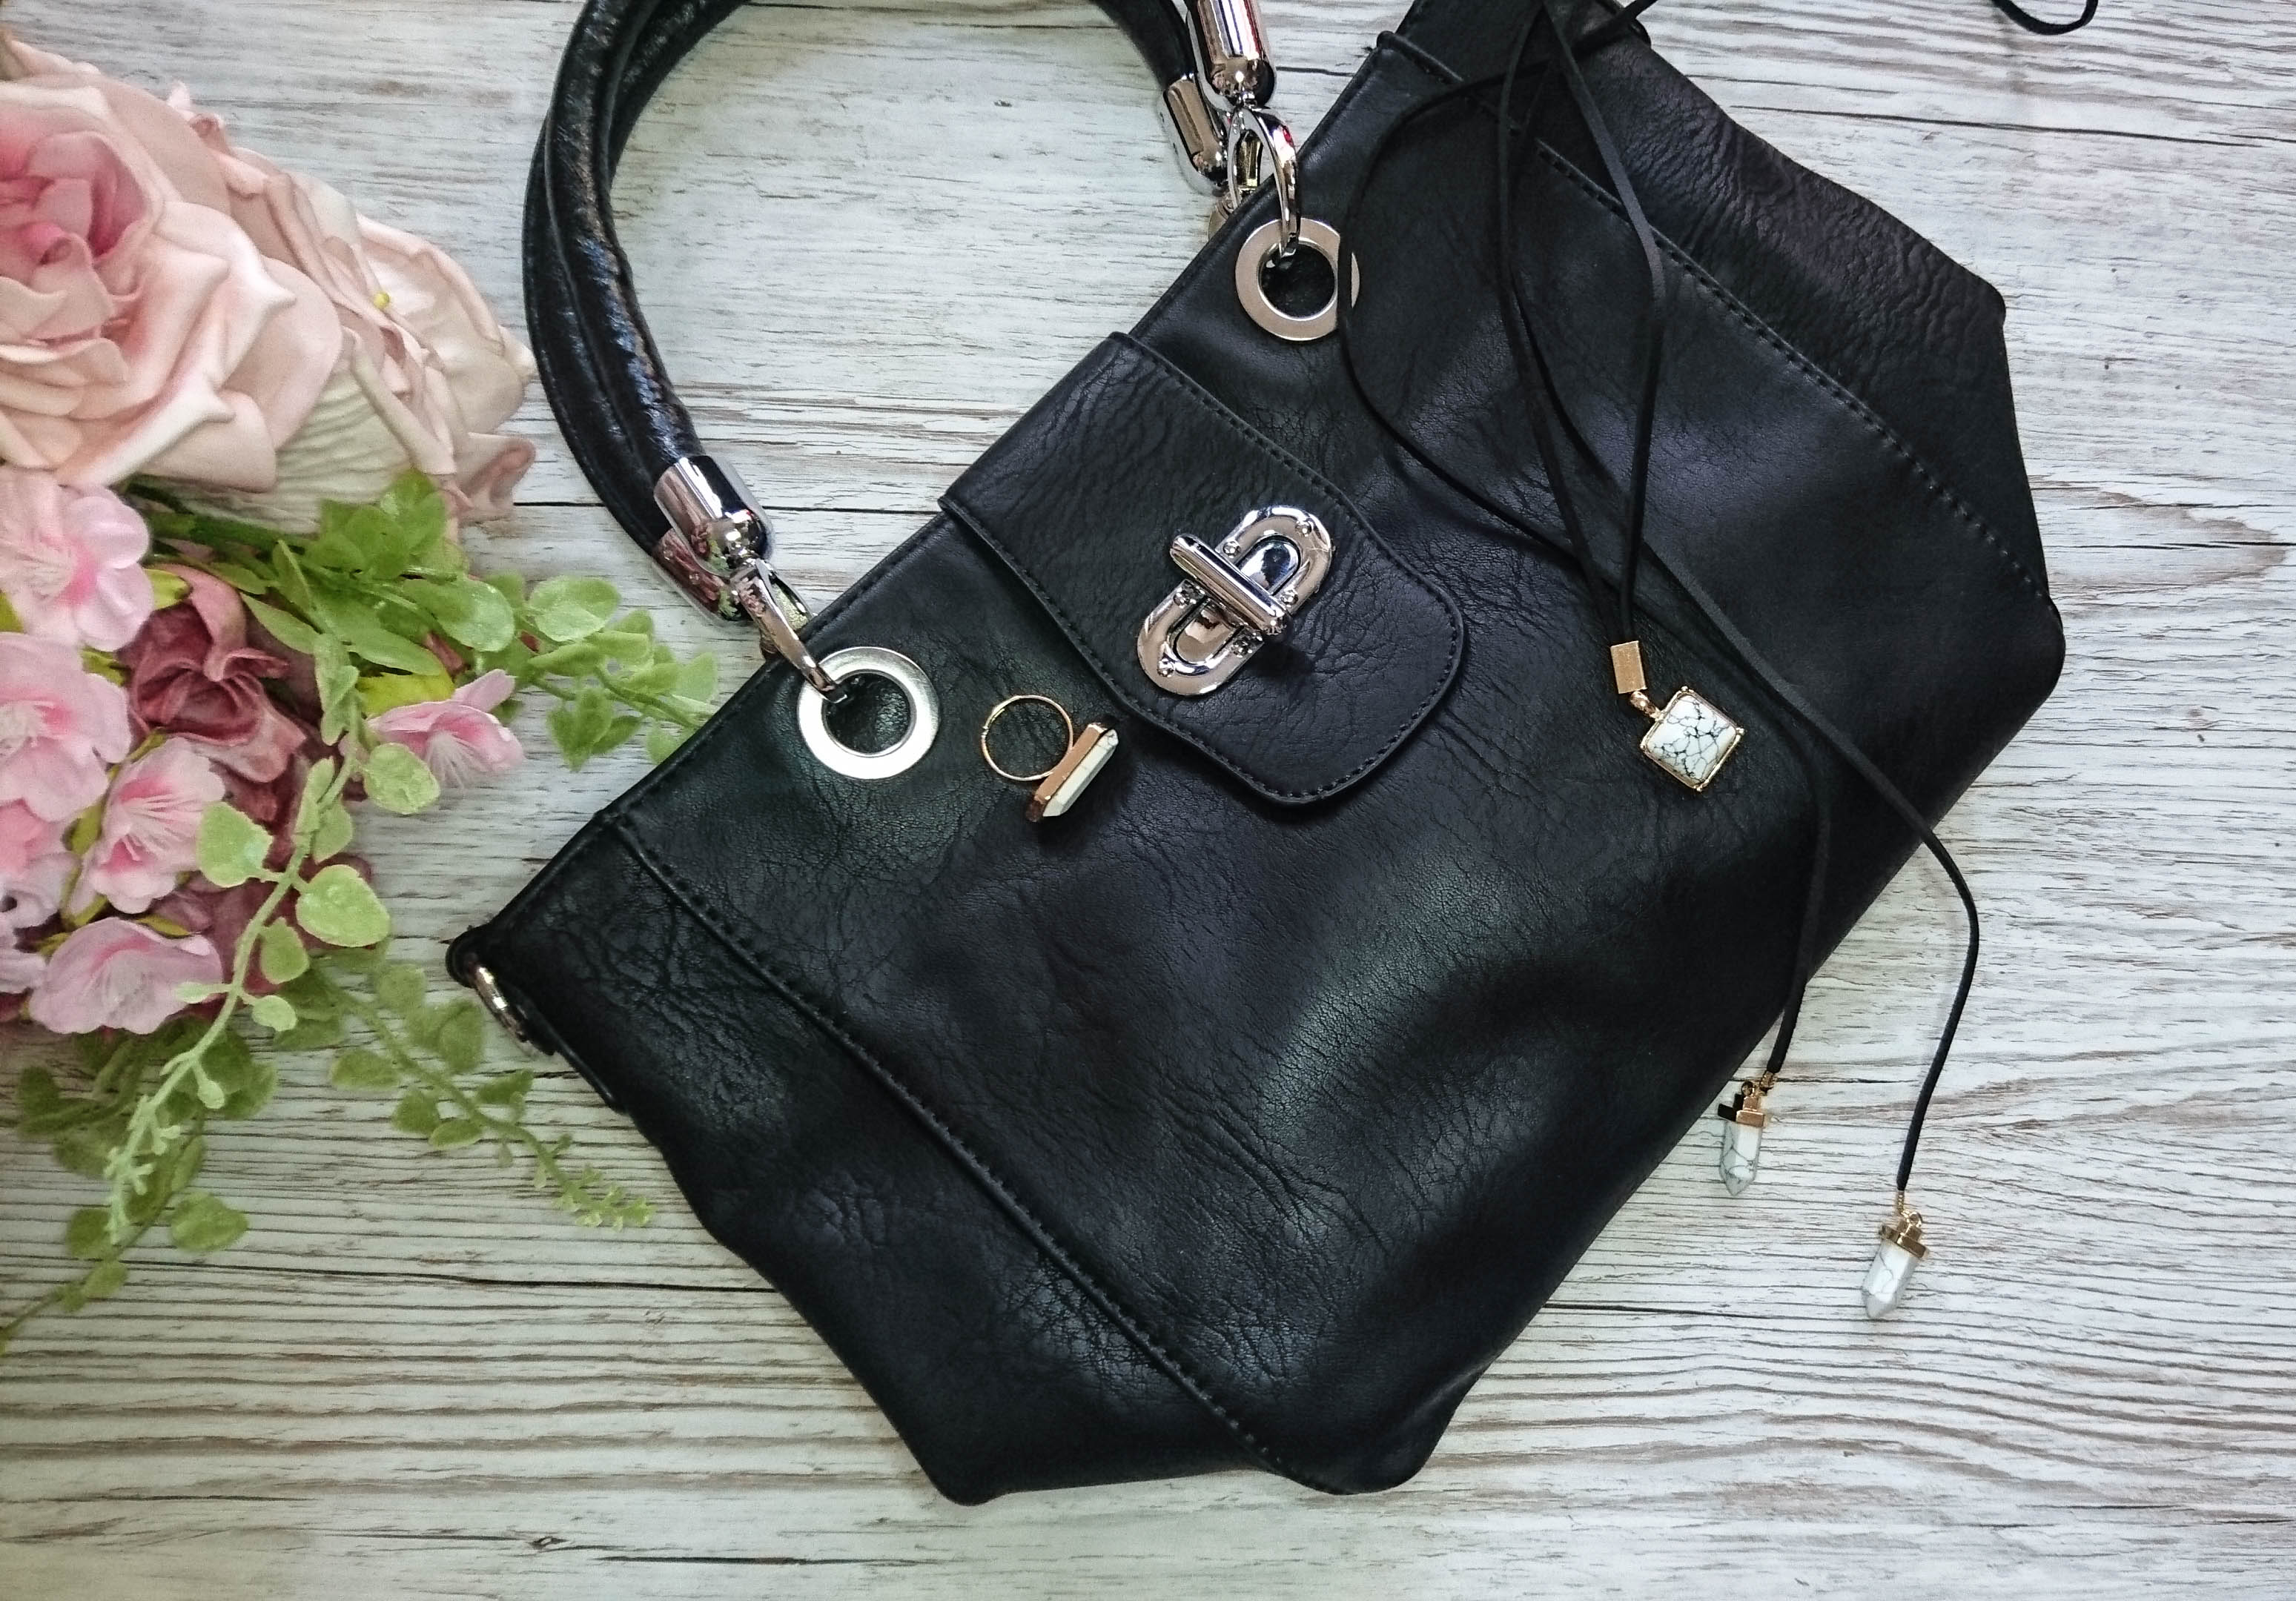 My new handbag, choker and ring frokm LOTD